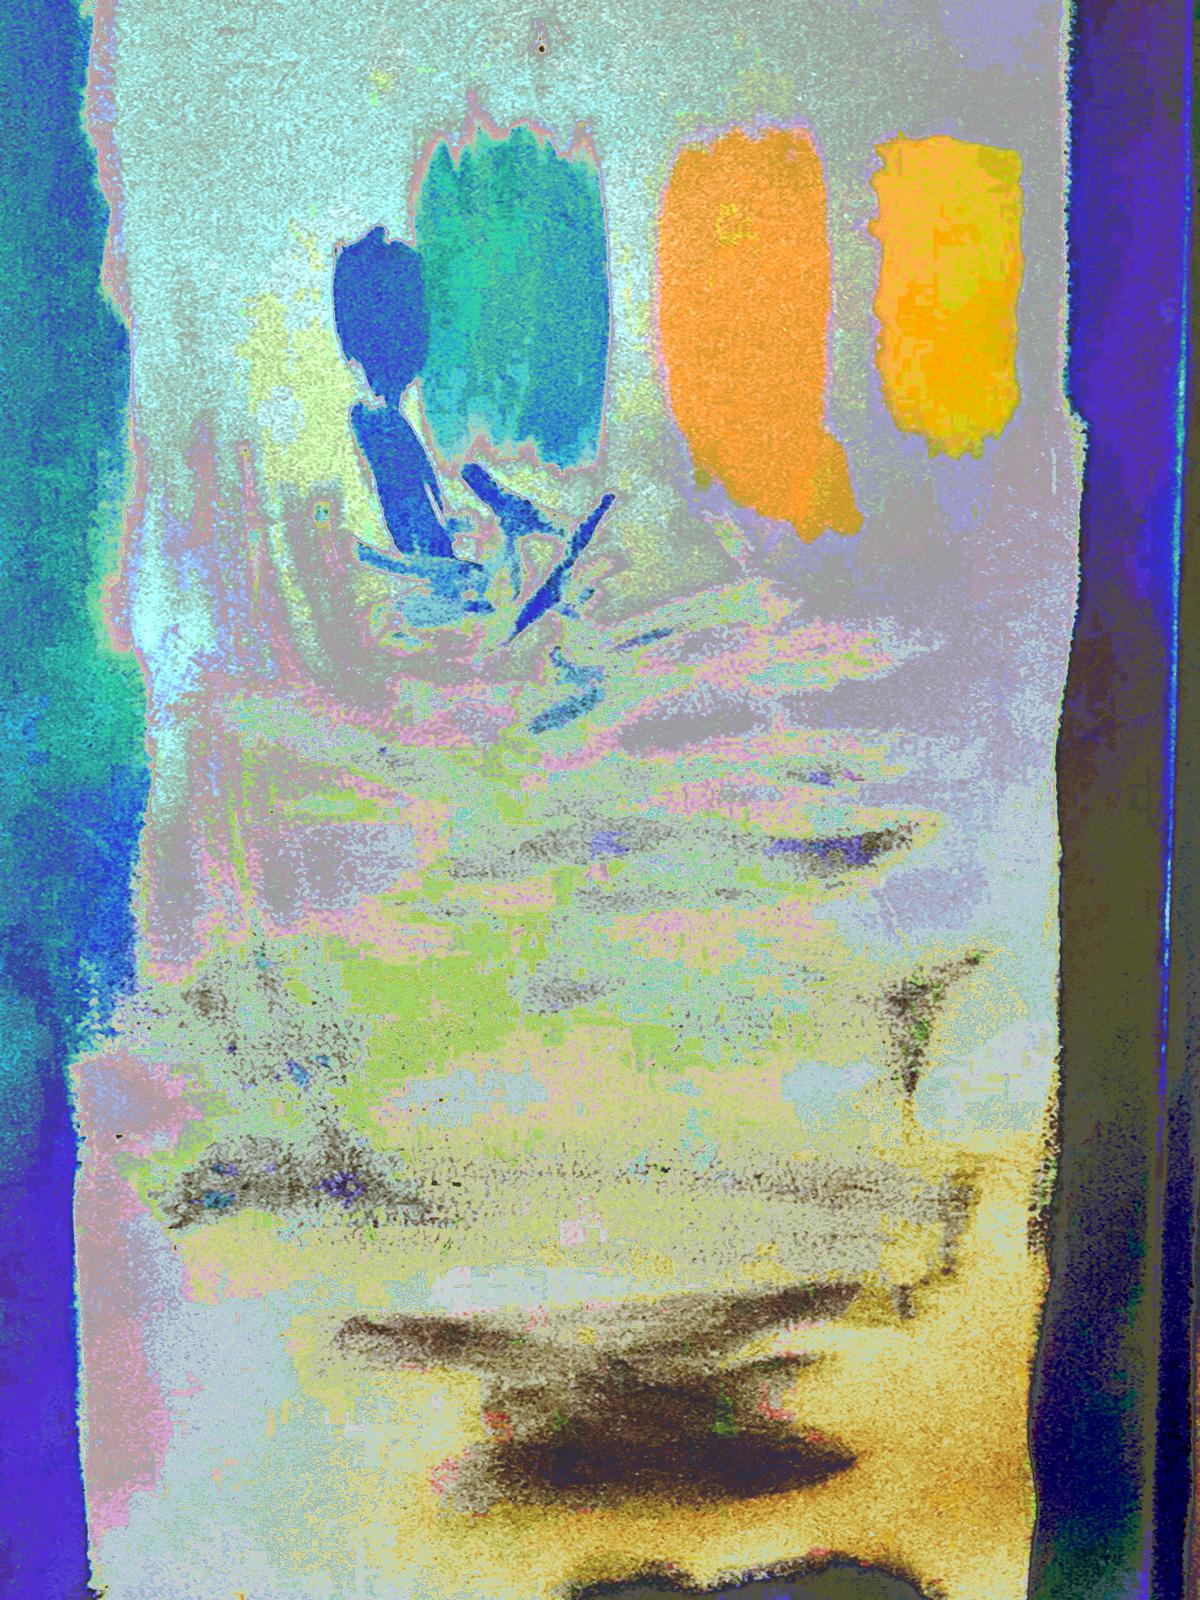 AbstractExpressionism-NancysStudy3b-levl-hue3-curv42.jpg